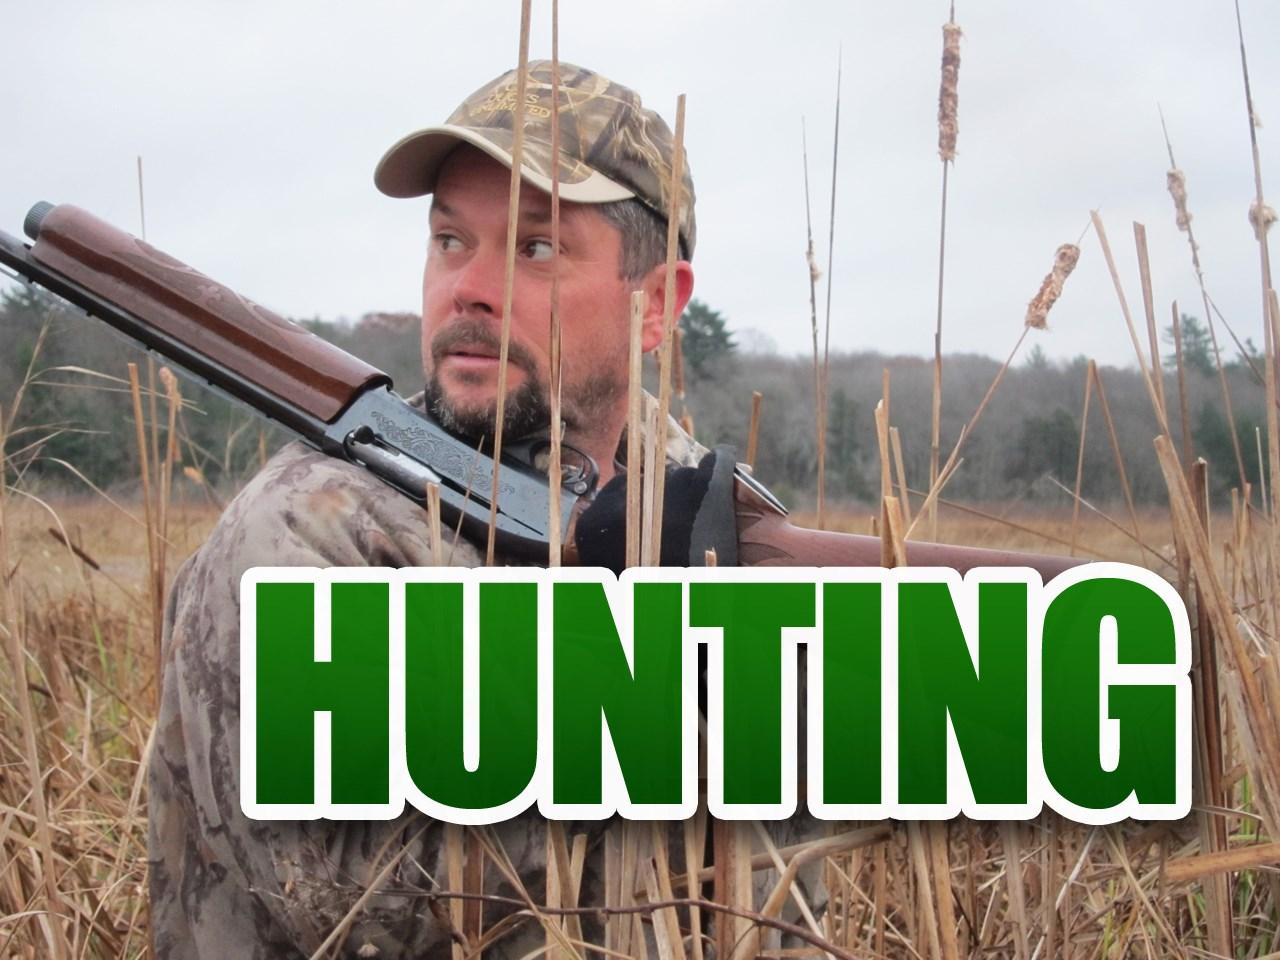 hunters_1471197533902.jpg